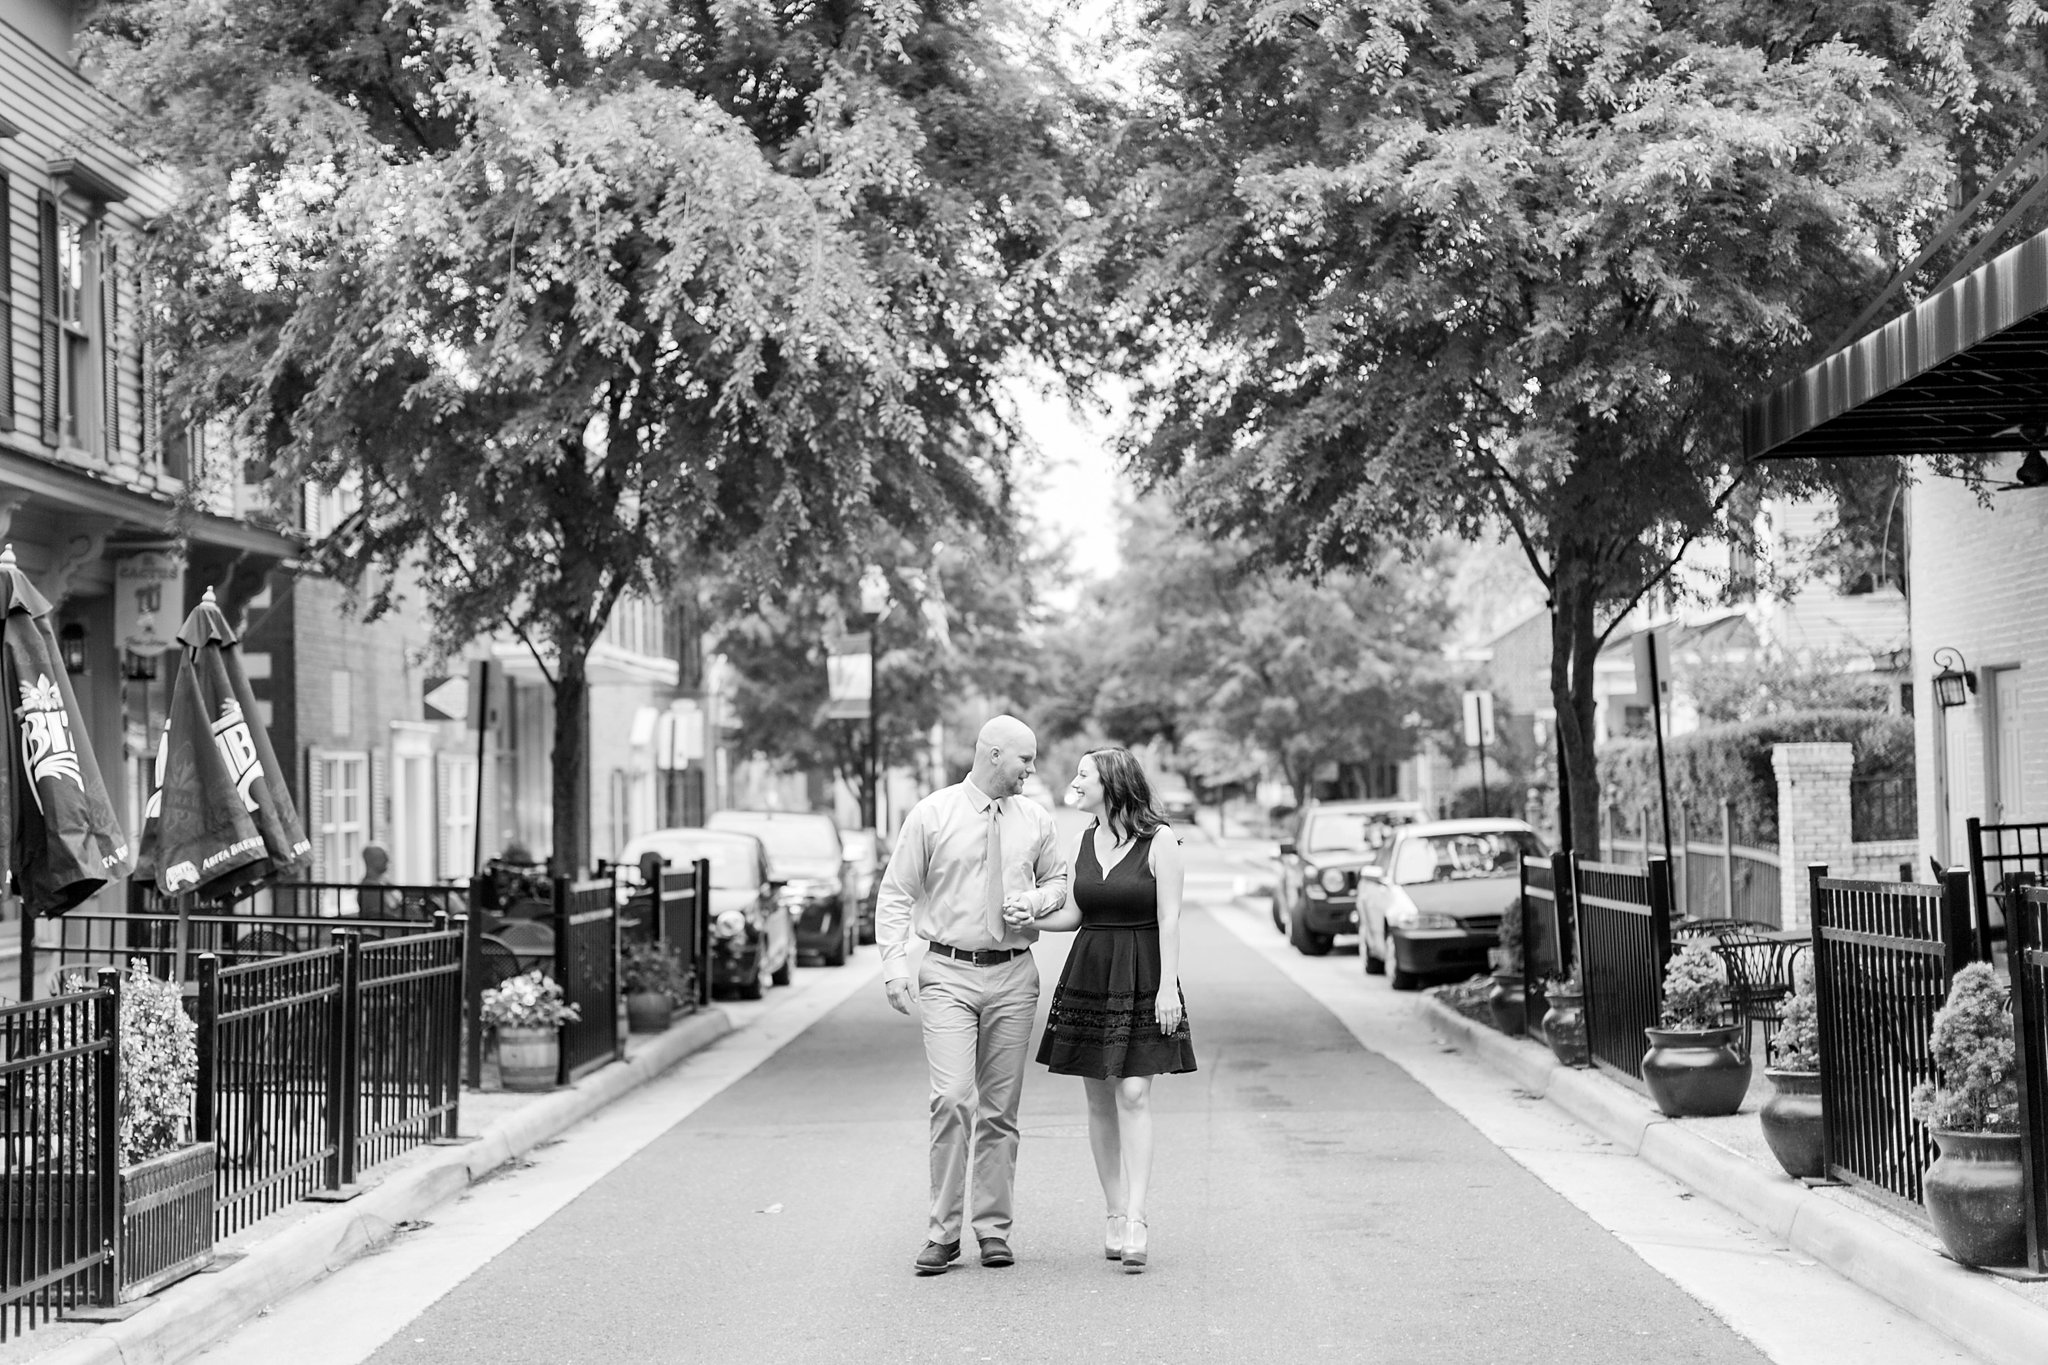 Old Town Manassas Battlefield Engagement Photos Virginia Wedding Photographer Jessica & Jason-82.jpg